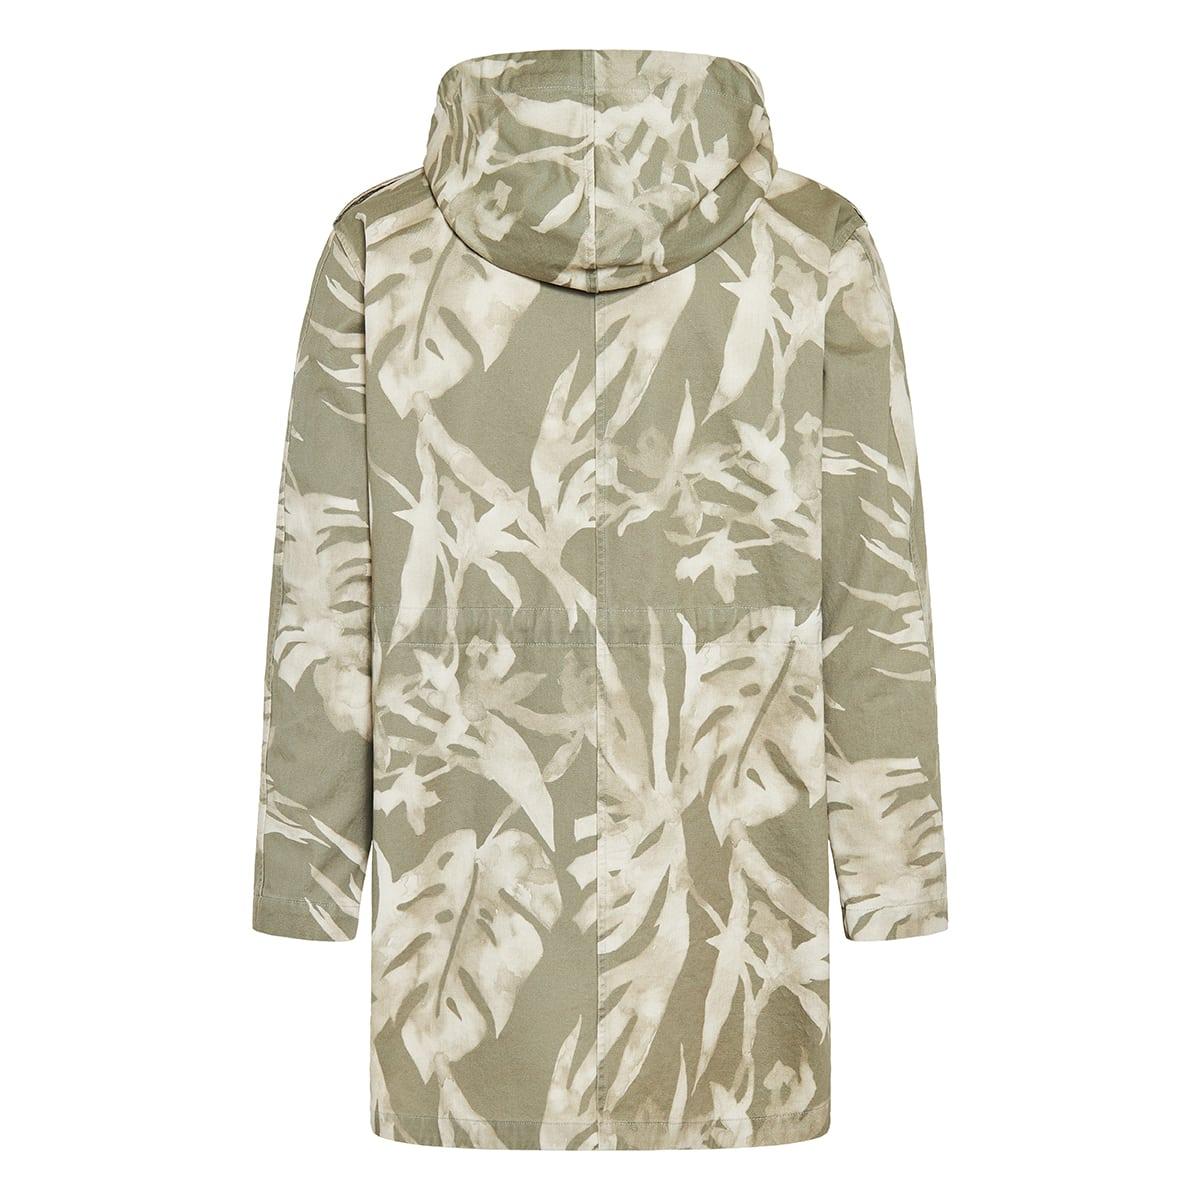 Leaf printed hooded parka